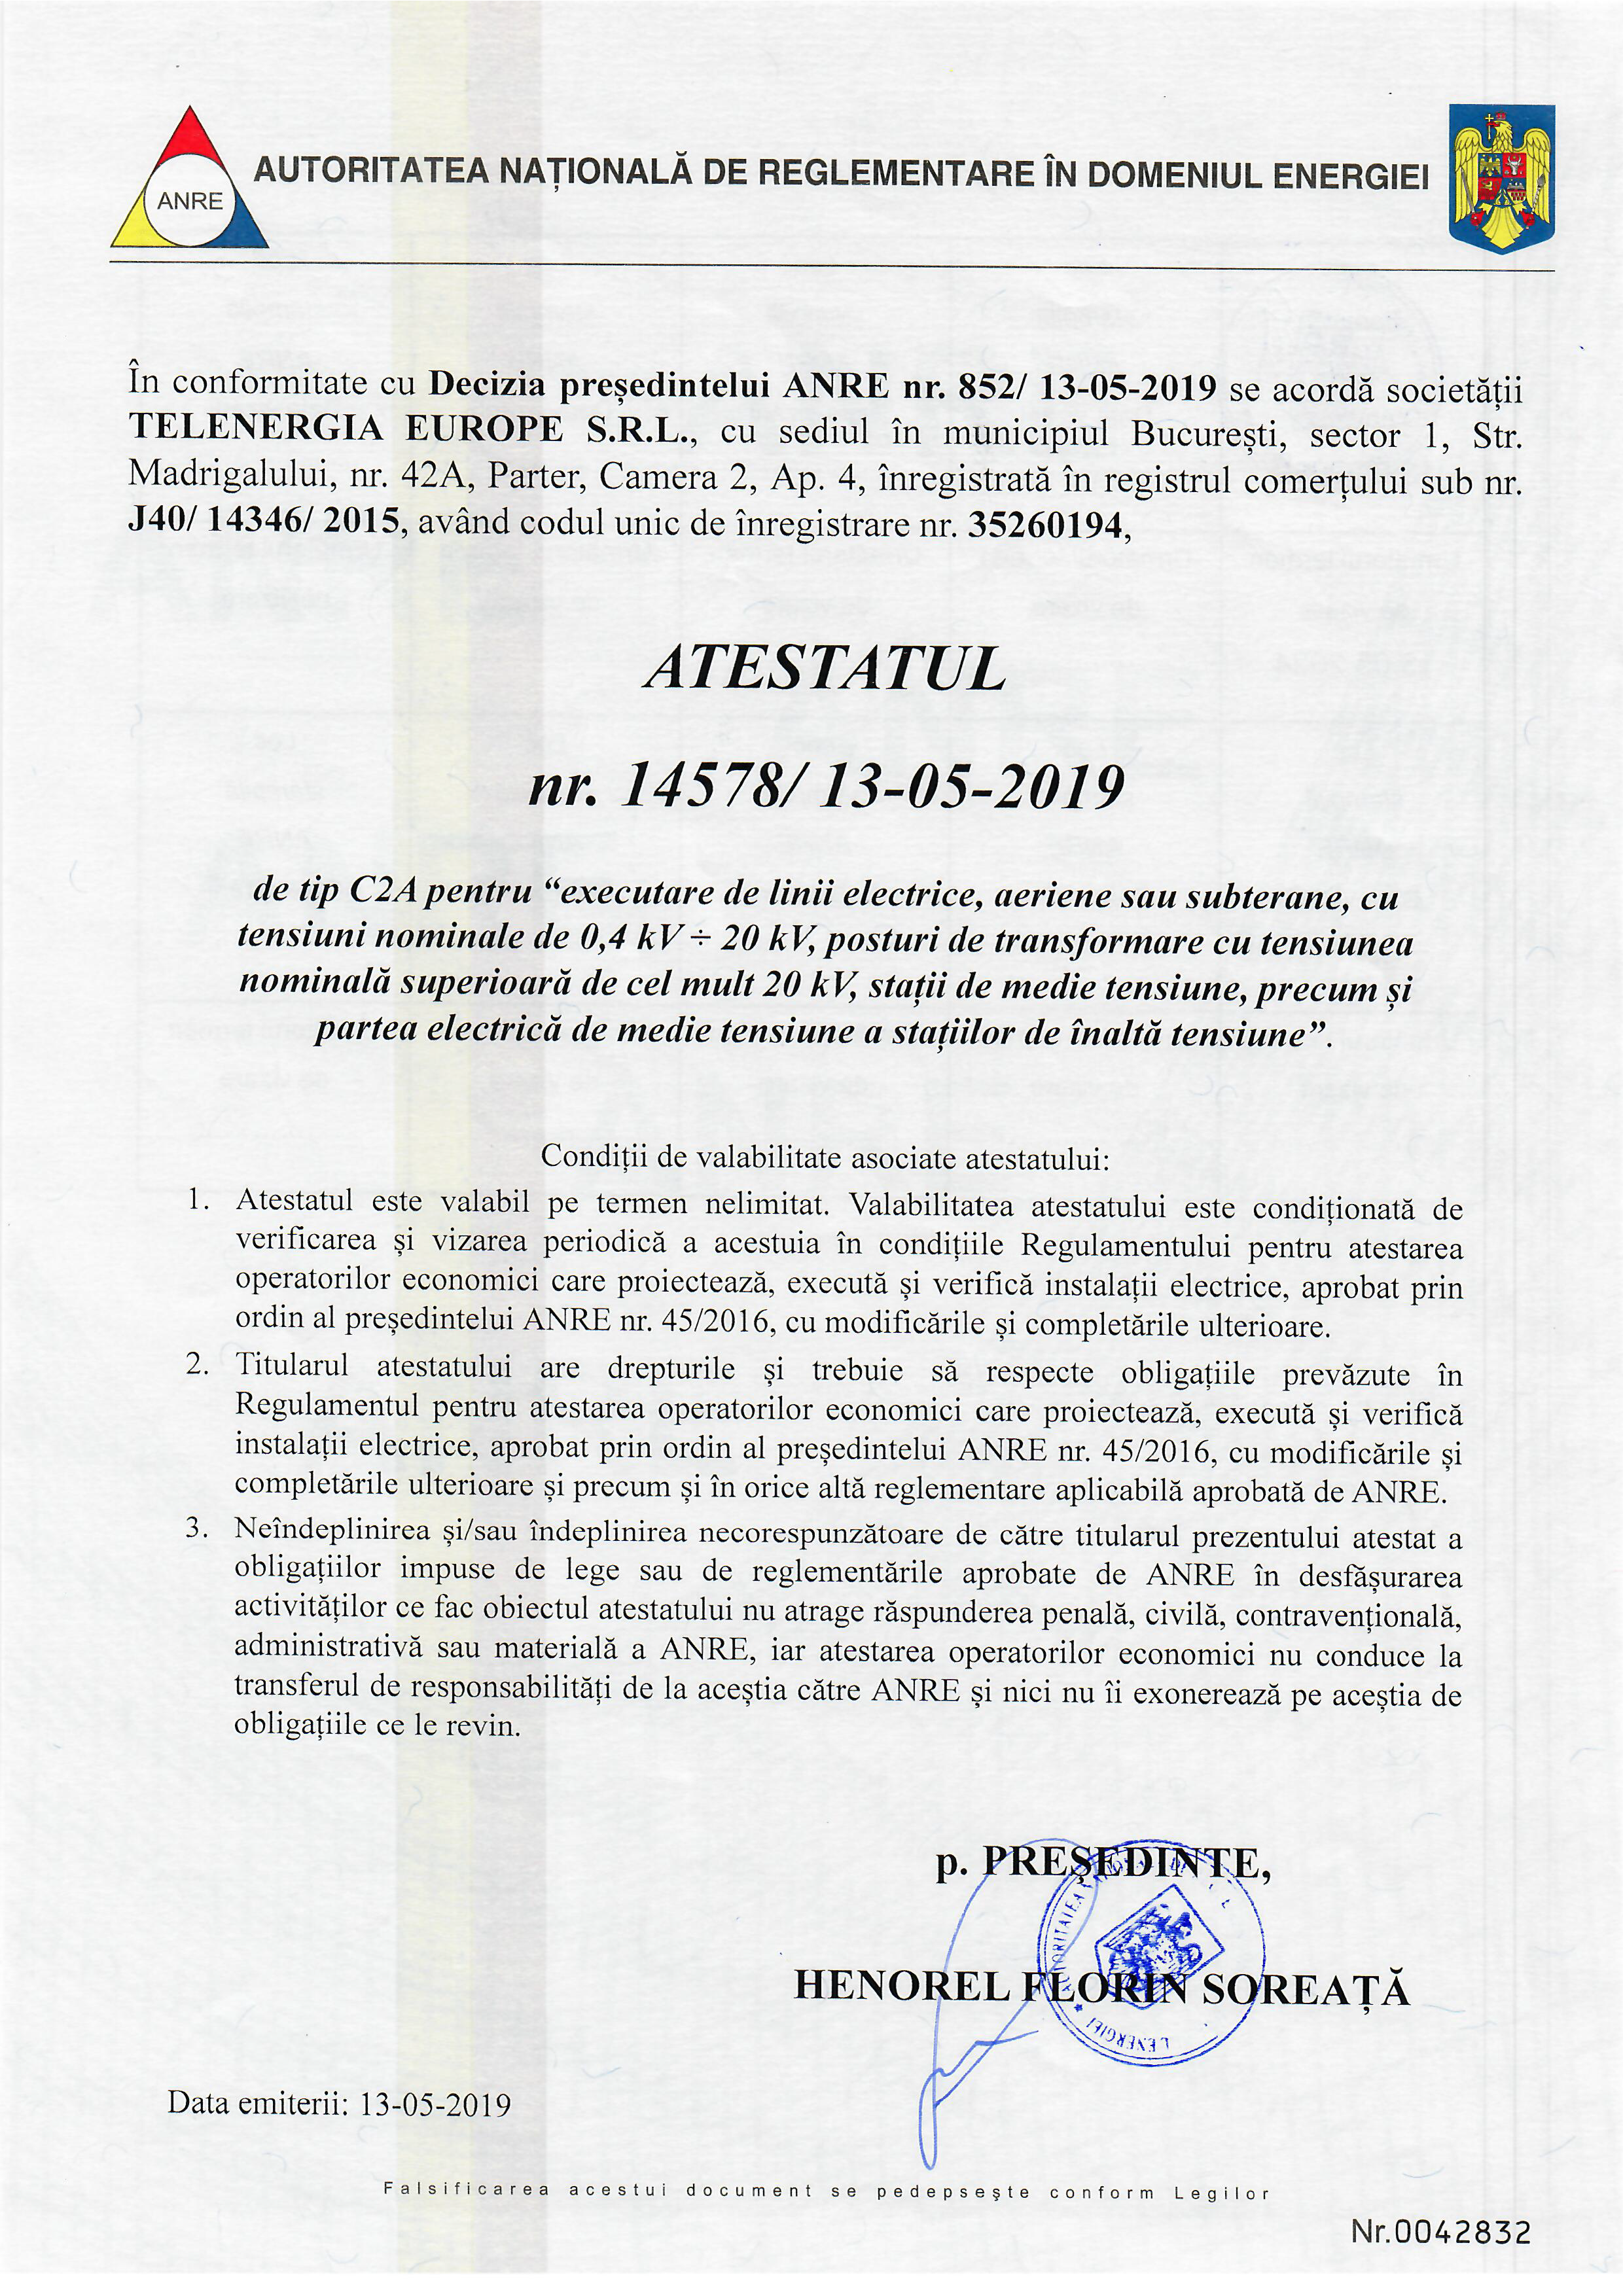 amte-attestato-c2a_page_1_page_1